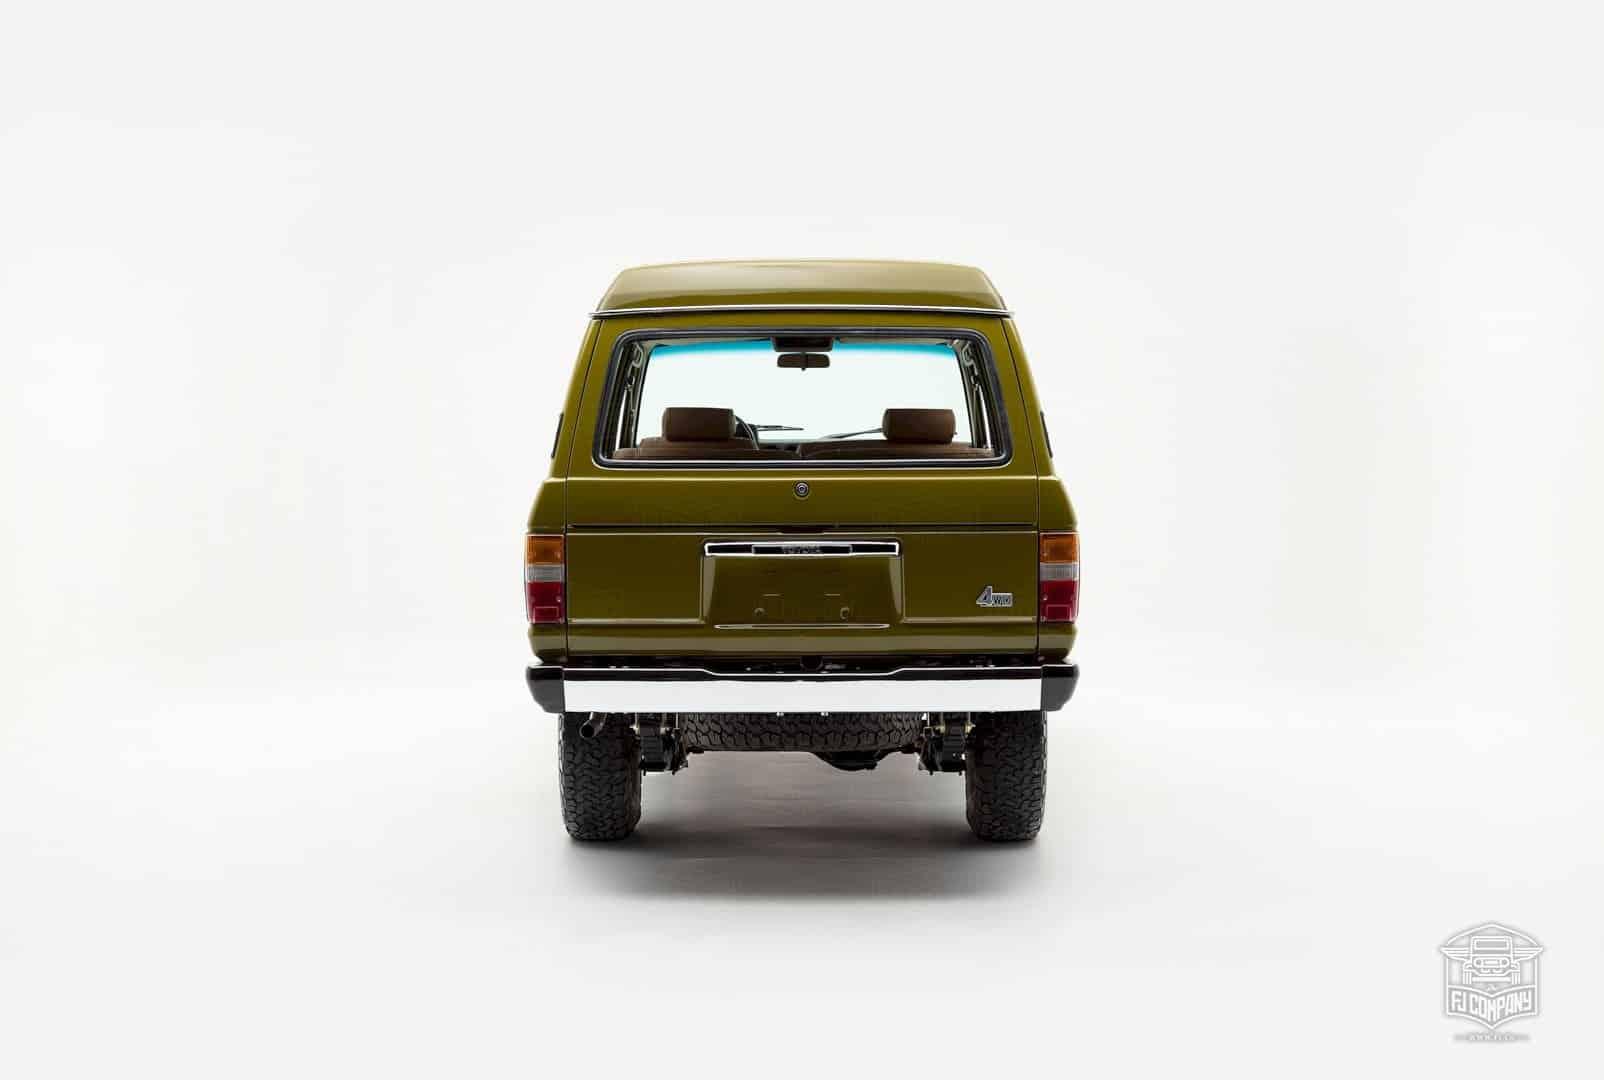 1986 Toyota Land Cruiser Fj62 Olive 7